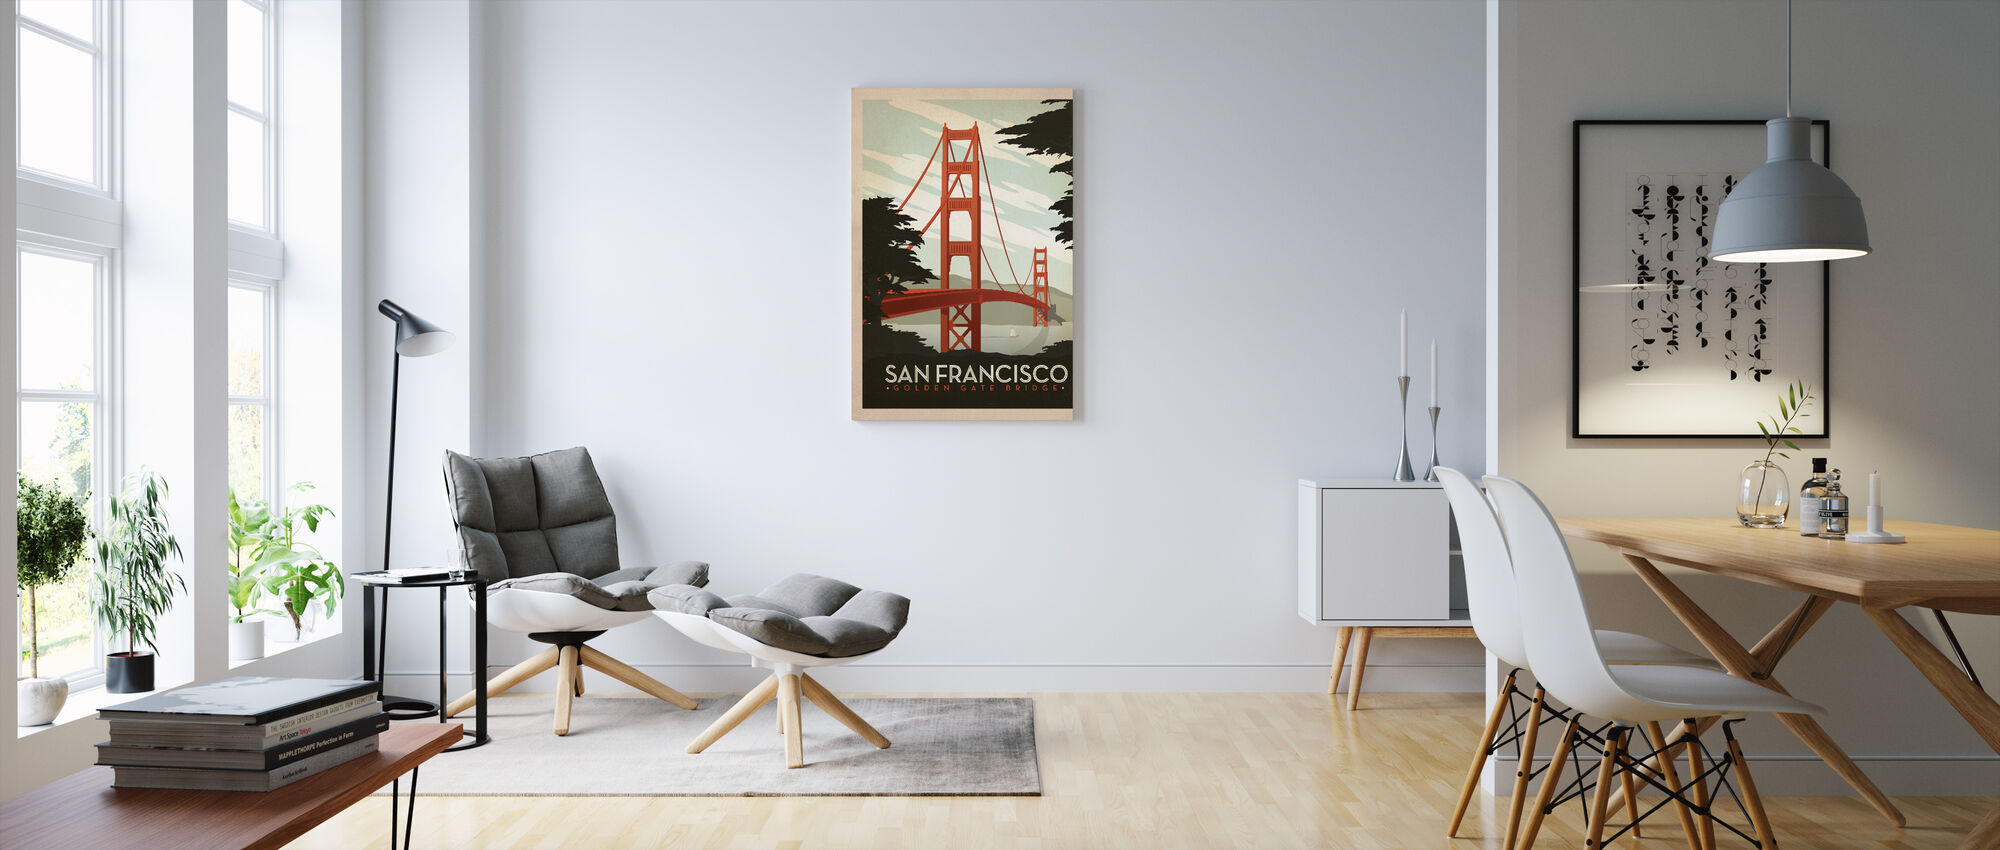 San Francisco - Canvastaulu - Olohuone